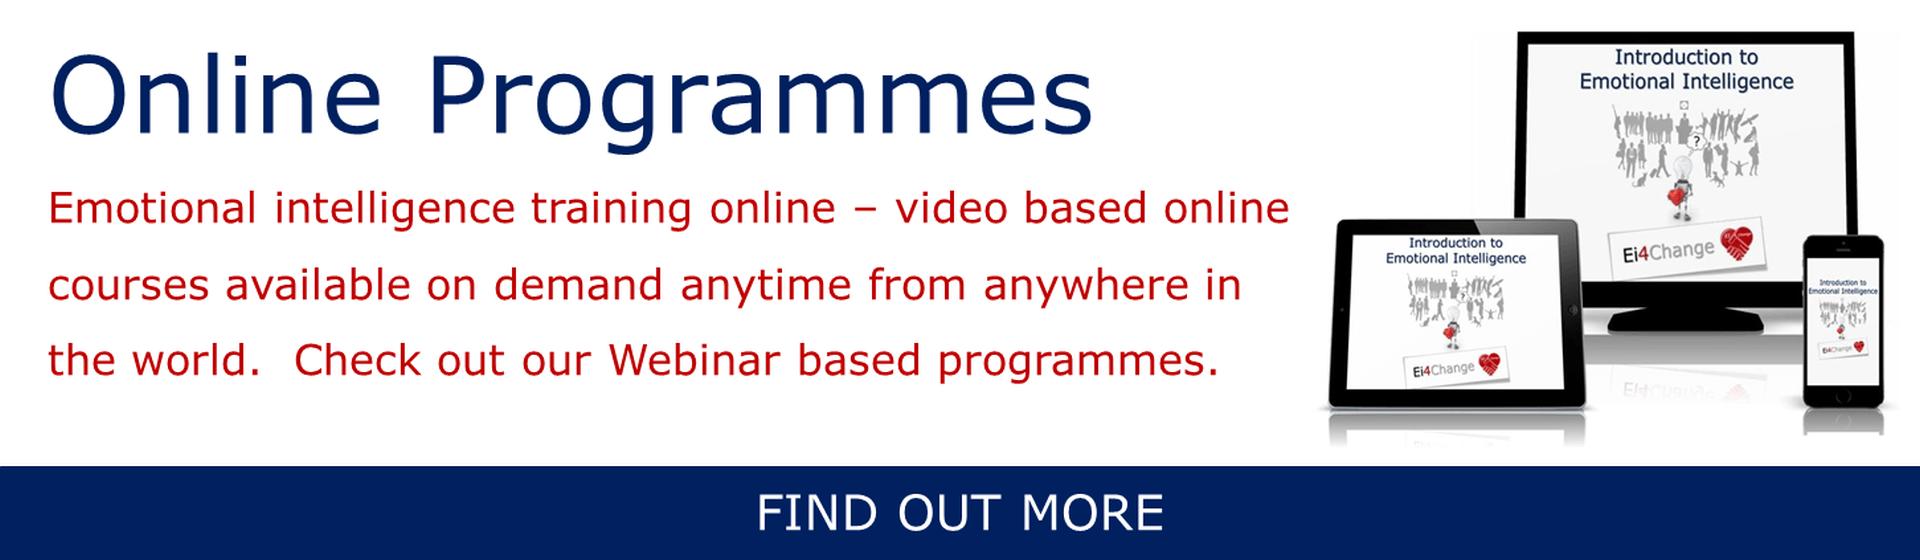 Online Programmes Banner